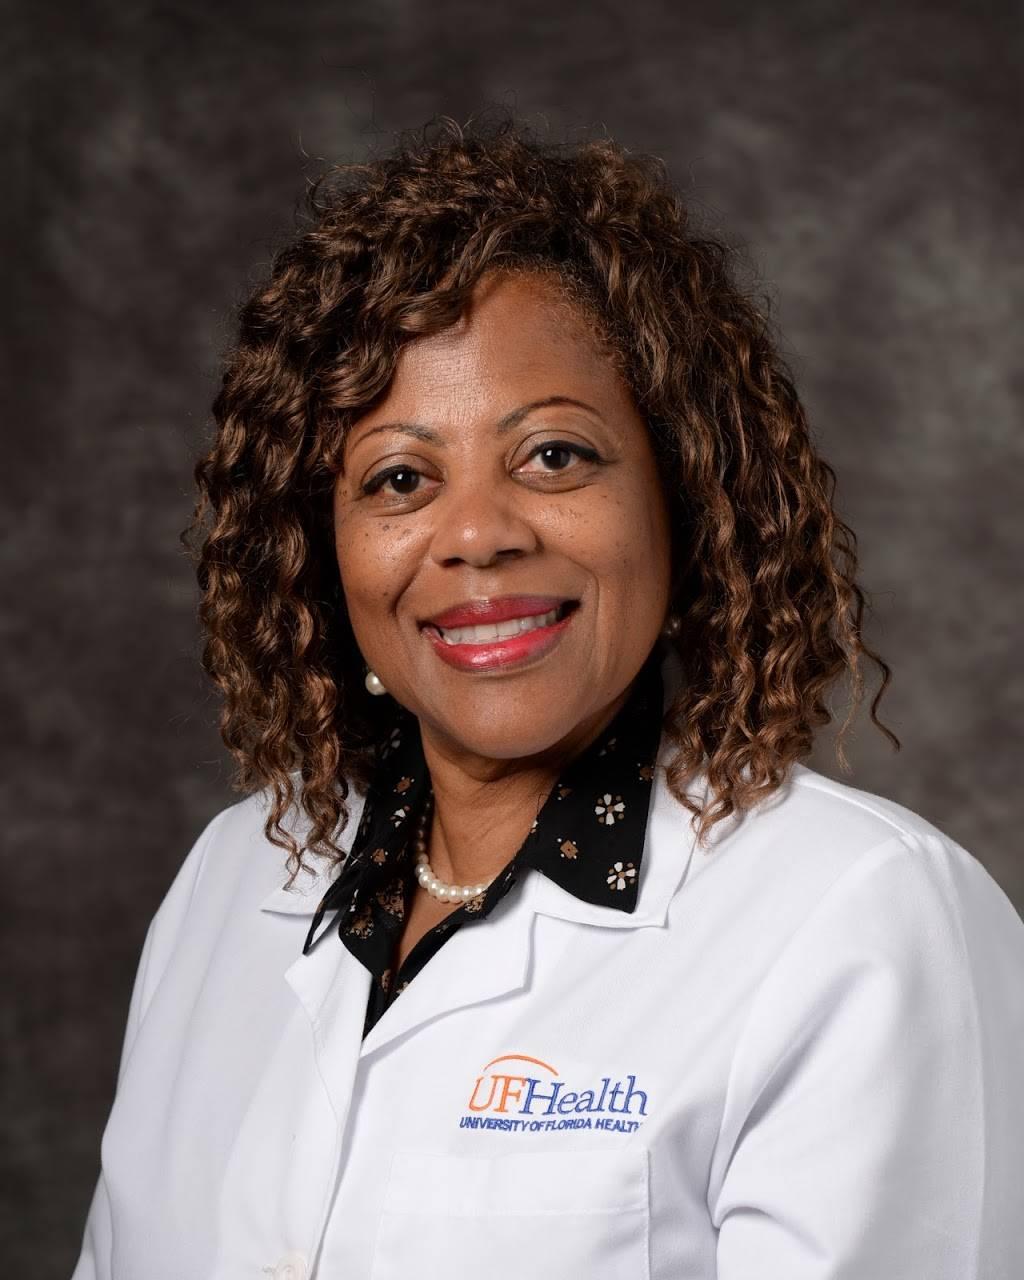 UF Health Family Medicine and Pediatrics – Blanding - hospital  | Photo 4 of 5 | Address: 6015 118th St, Jacksonville, FL 32244, USA | Phone: (904) 633-0610